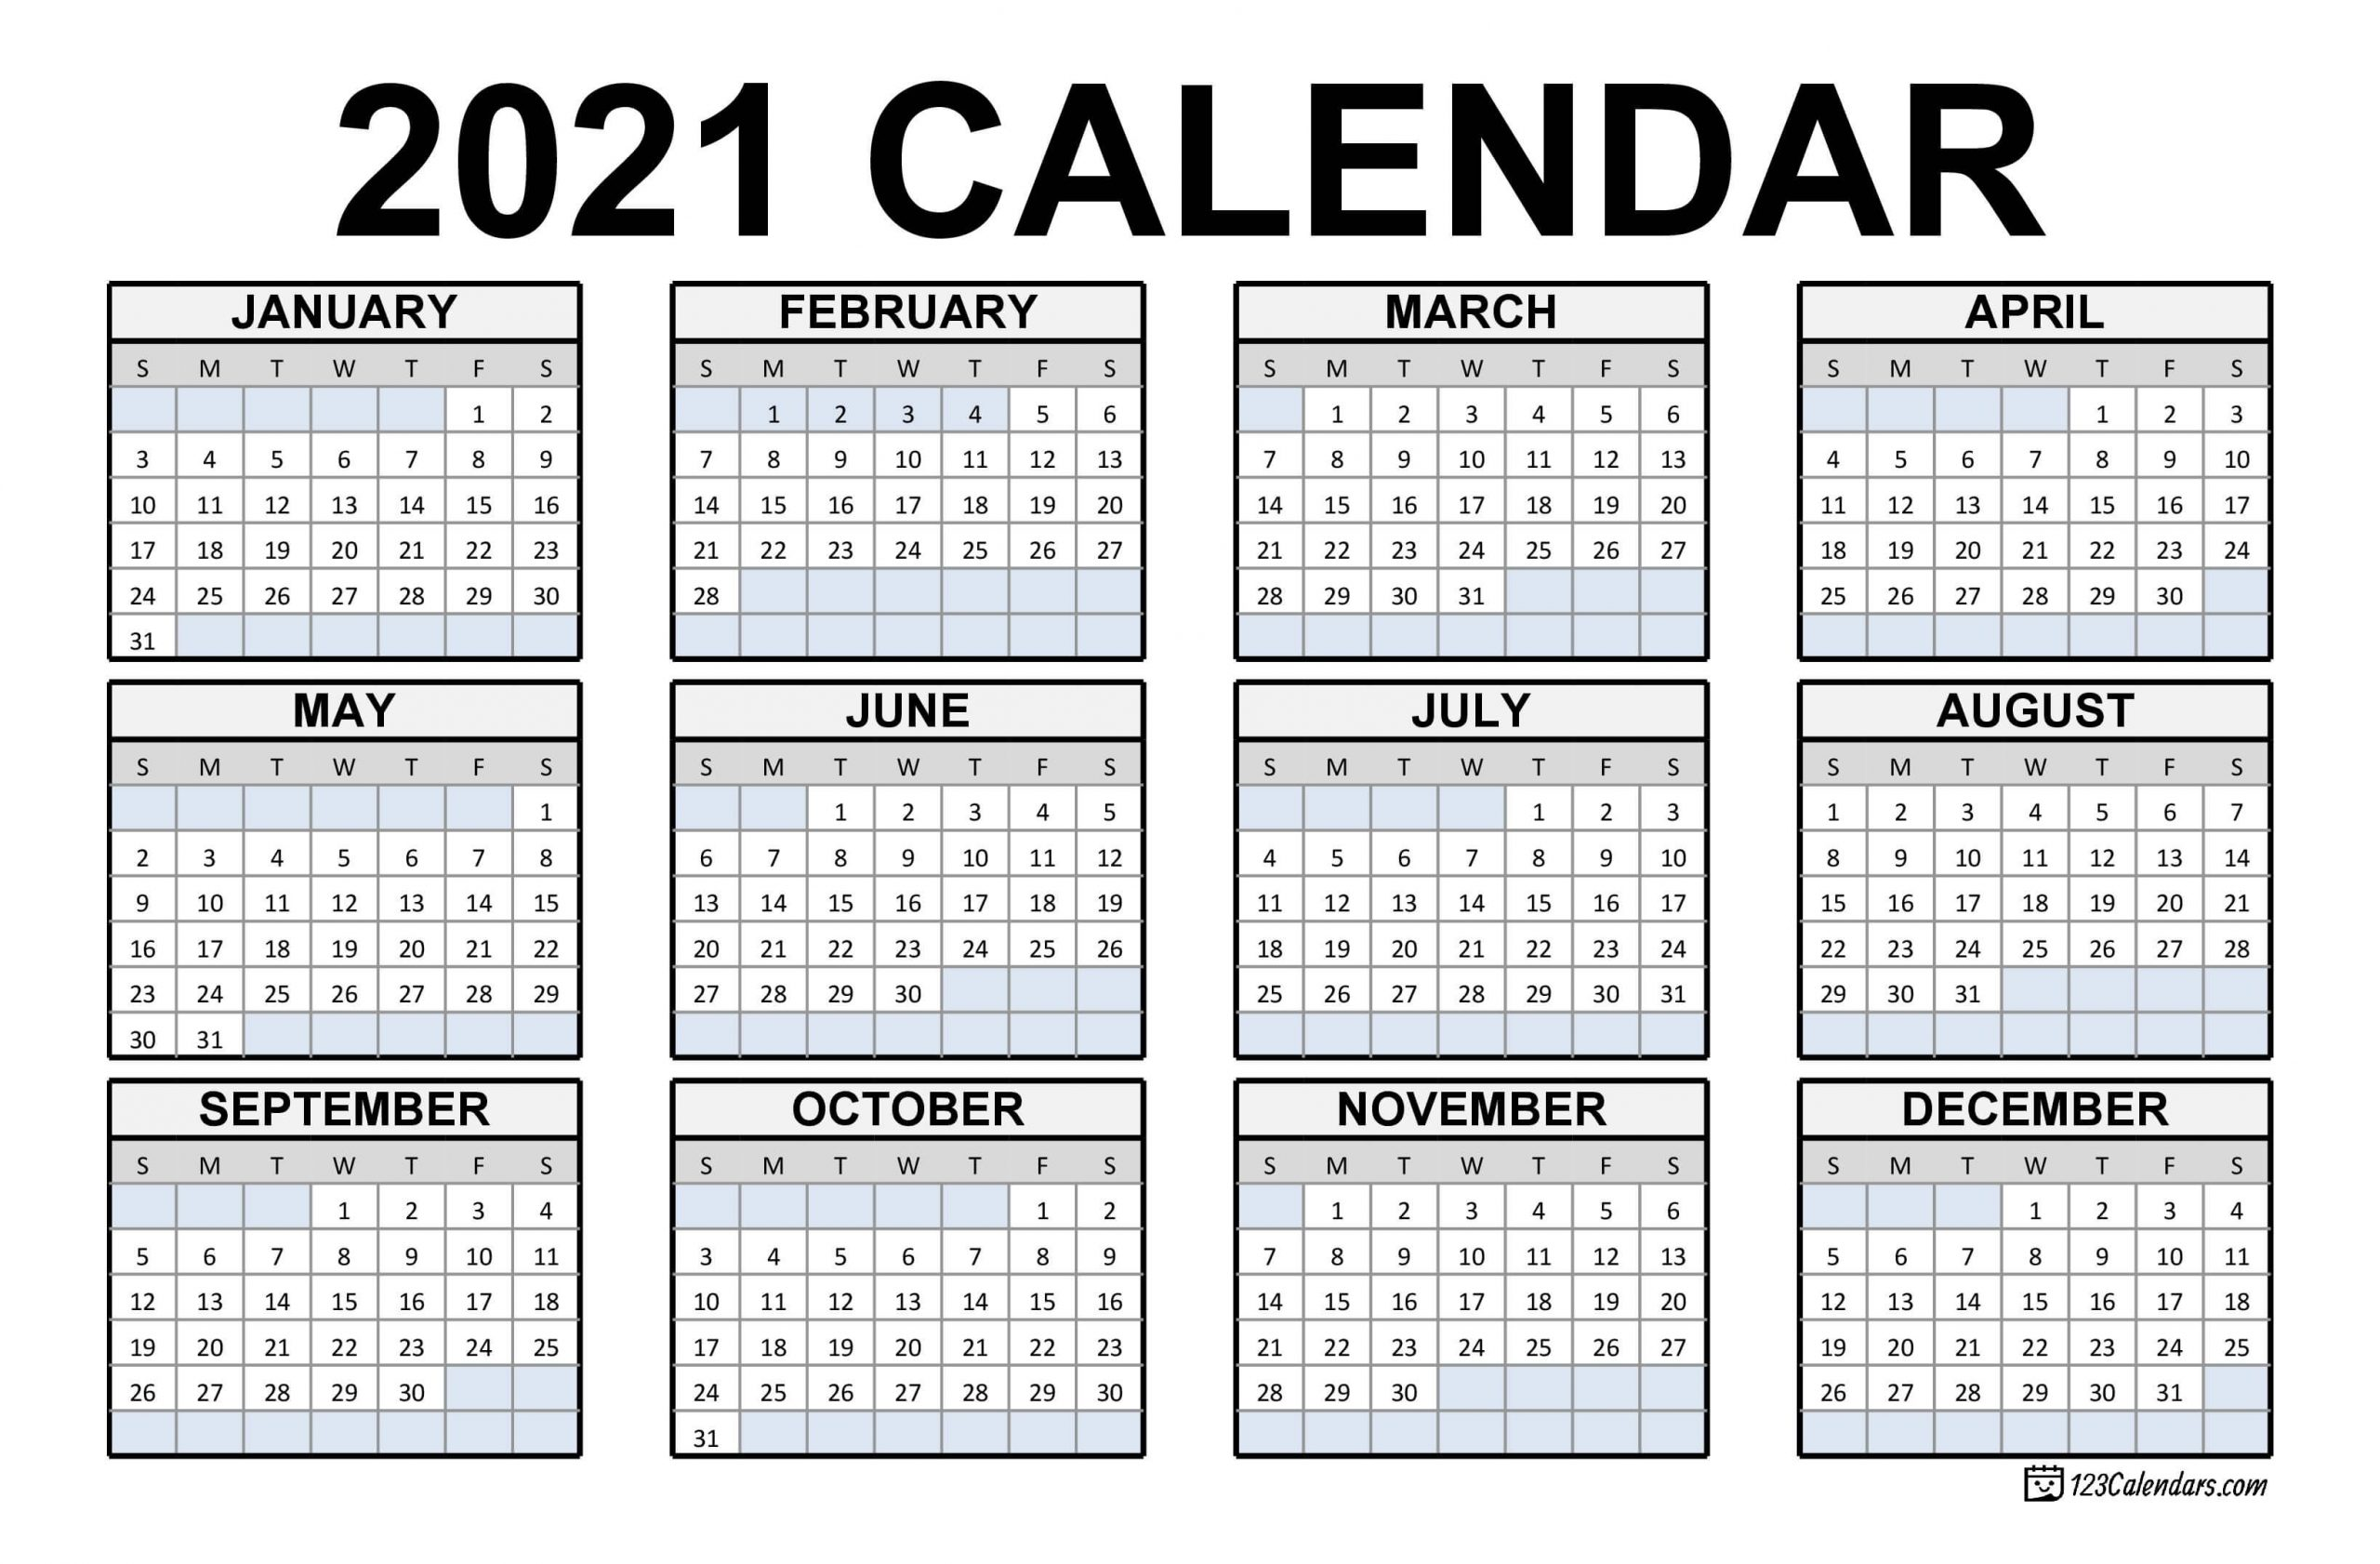 2021 Printable Calendar | 123Calendars  Checkbook Size Calendar Printable